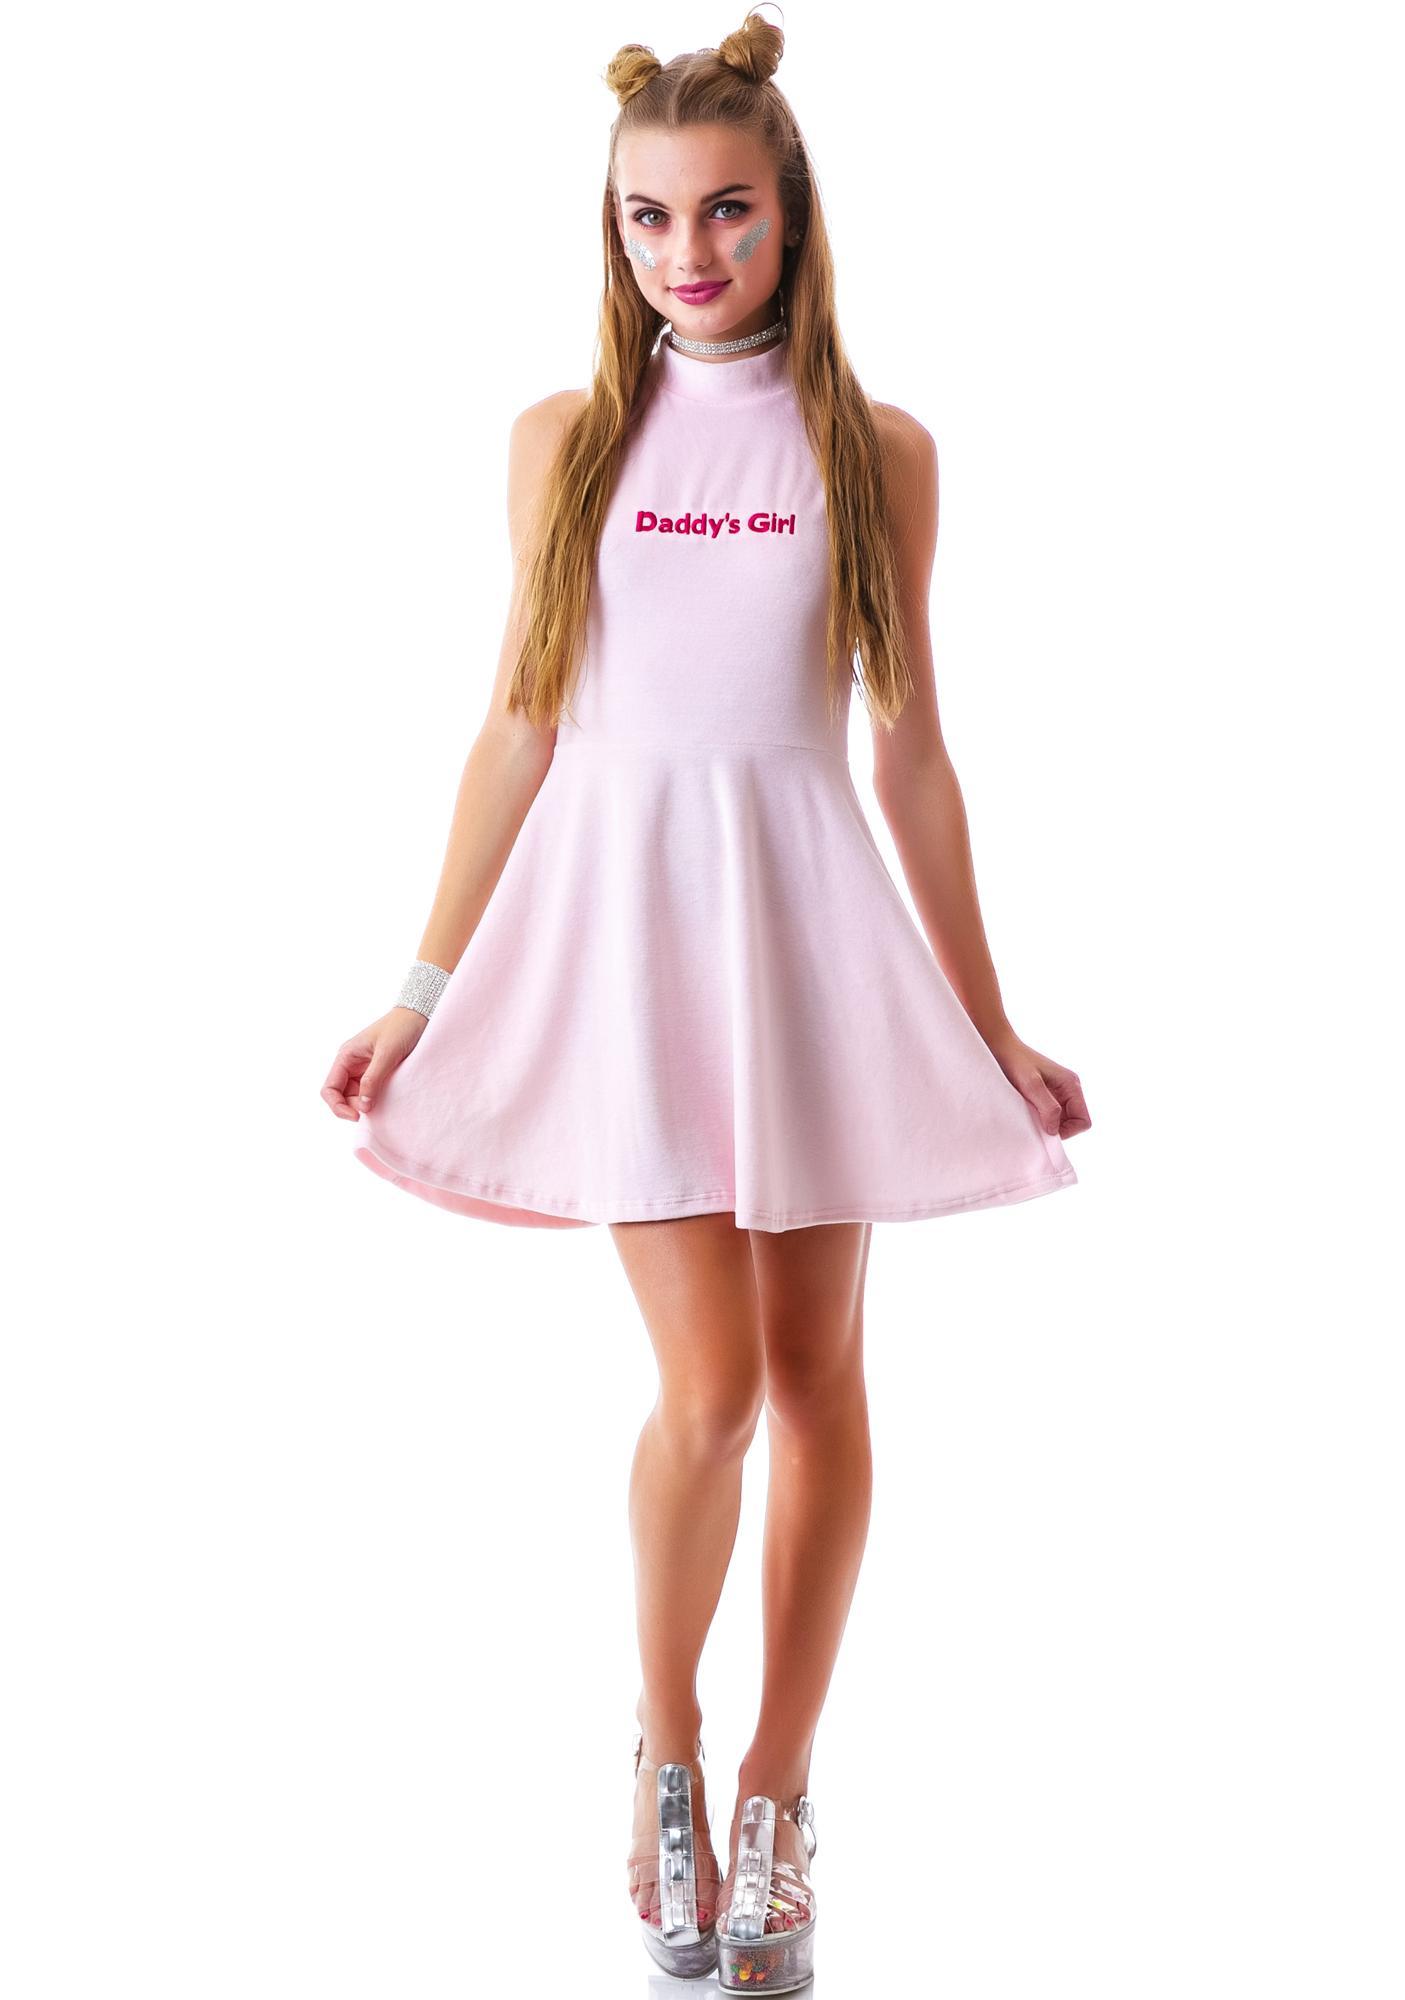 745545f28 United Couture Daddy's Girl Velvet Sugar Dress | Dolls Kill